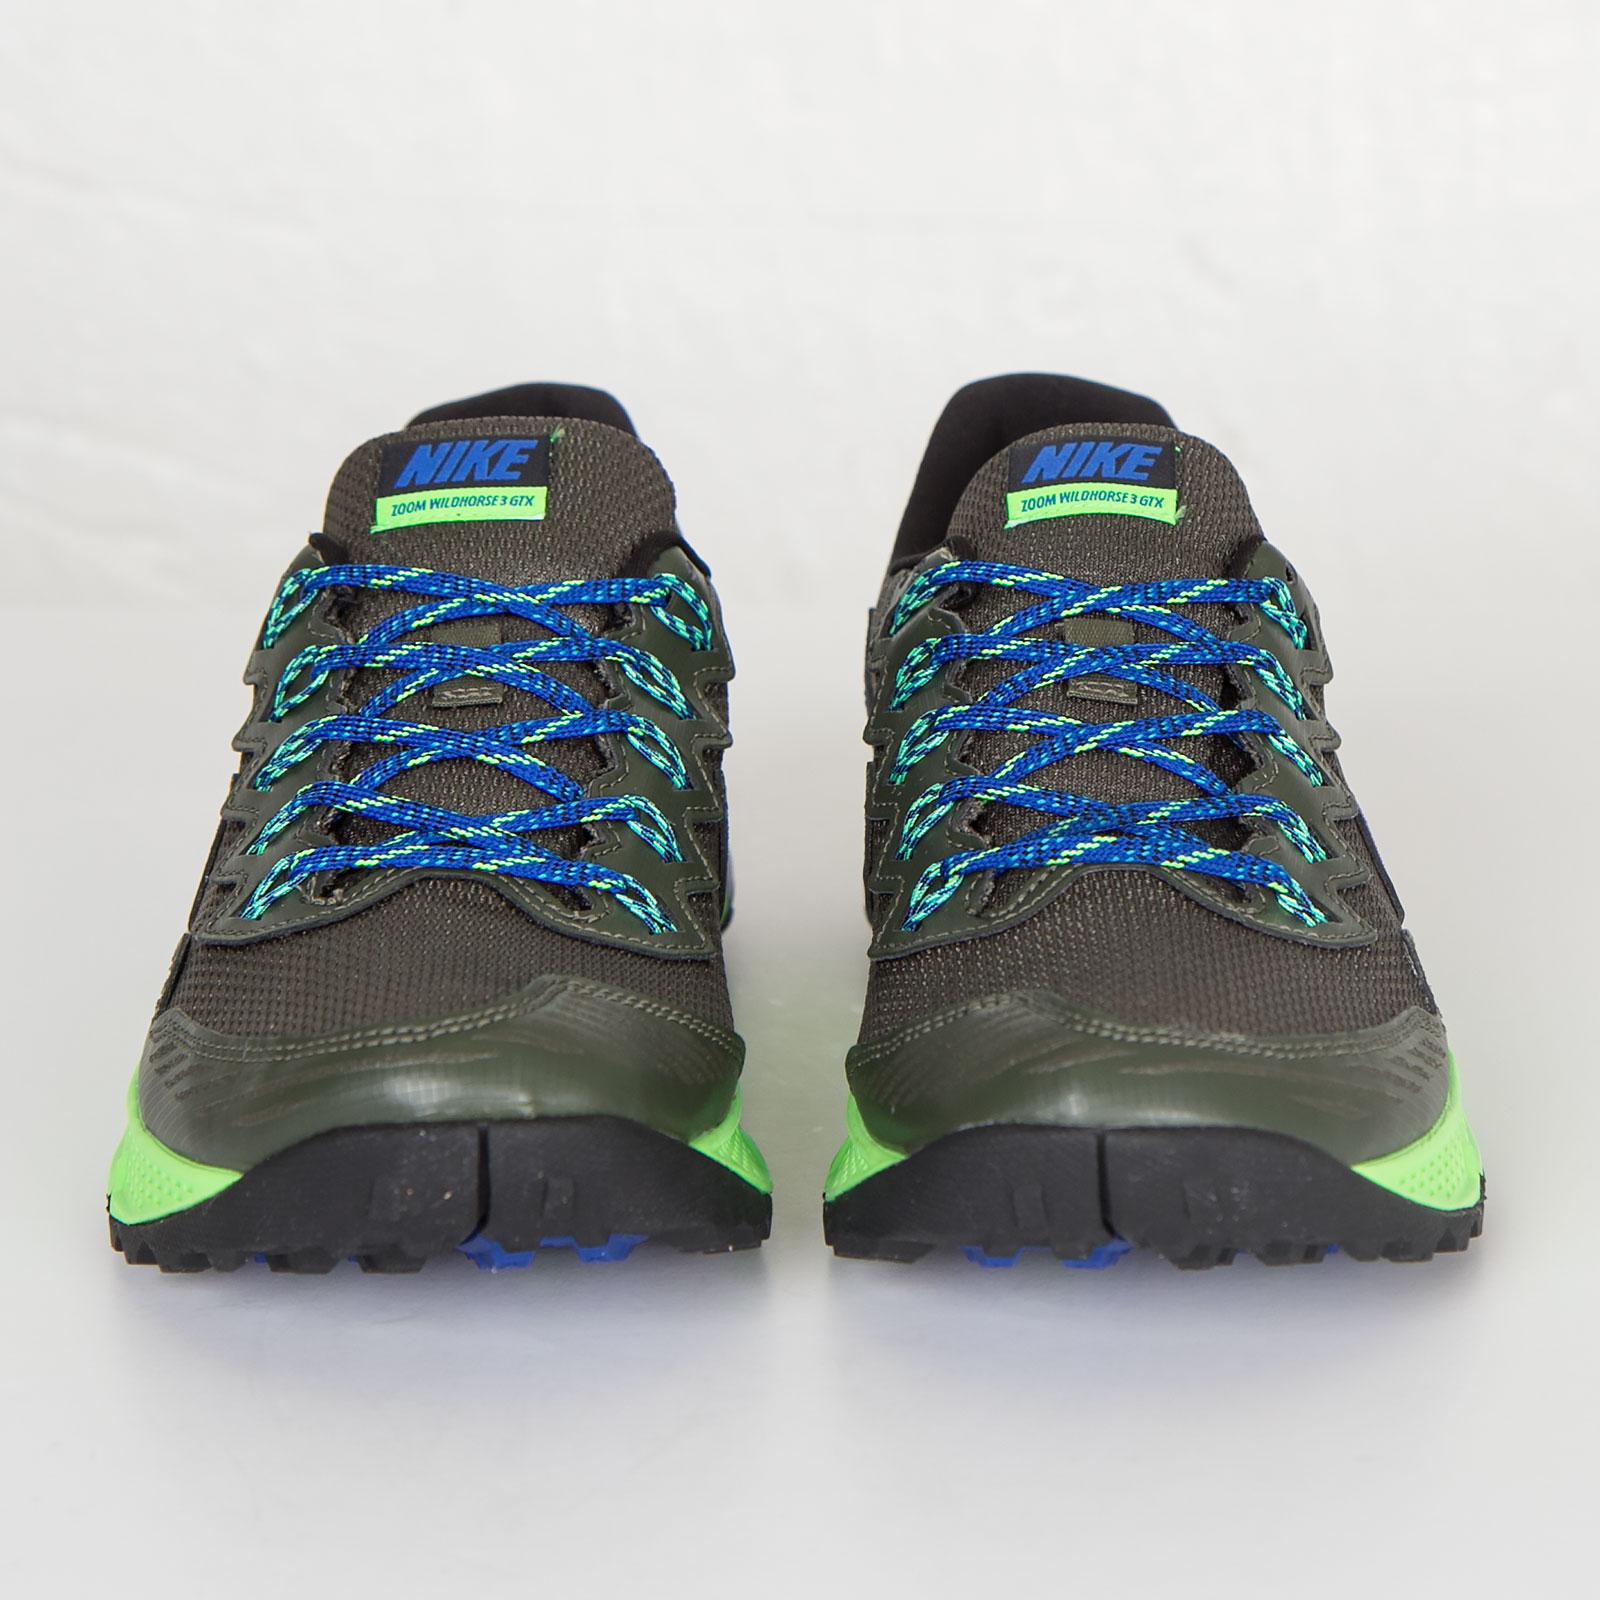 72ac416b939b2 Nike Air Zoom Wildhorse 3 GTX - 805569-300 - Sneakersnstuff ...